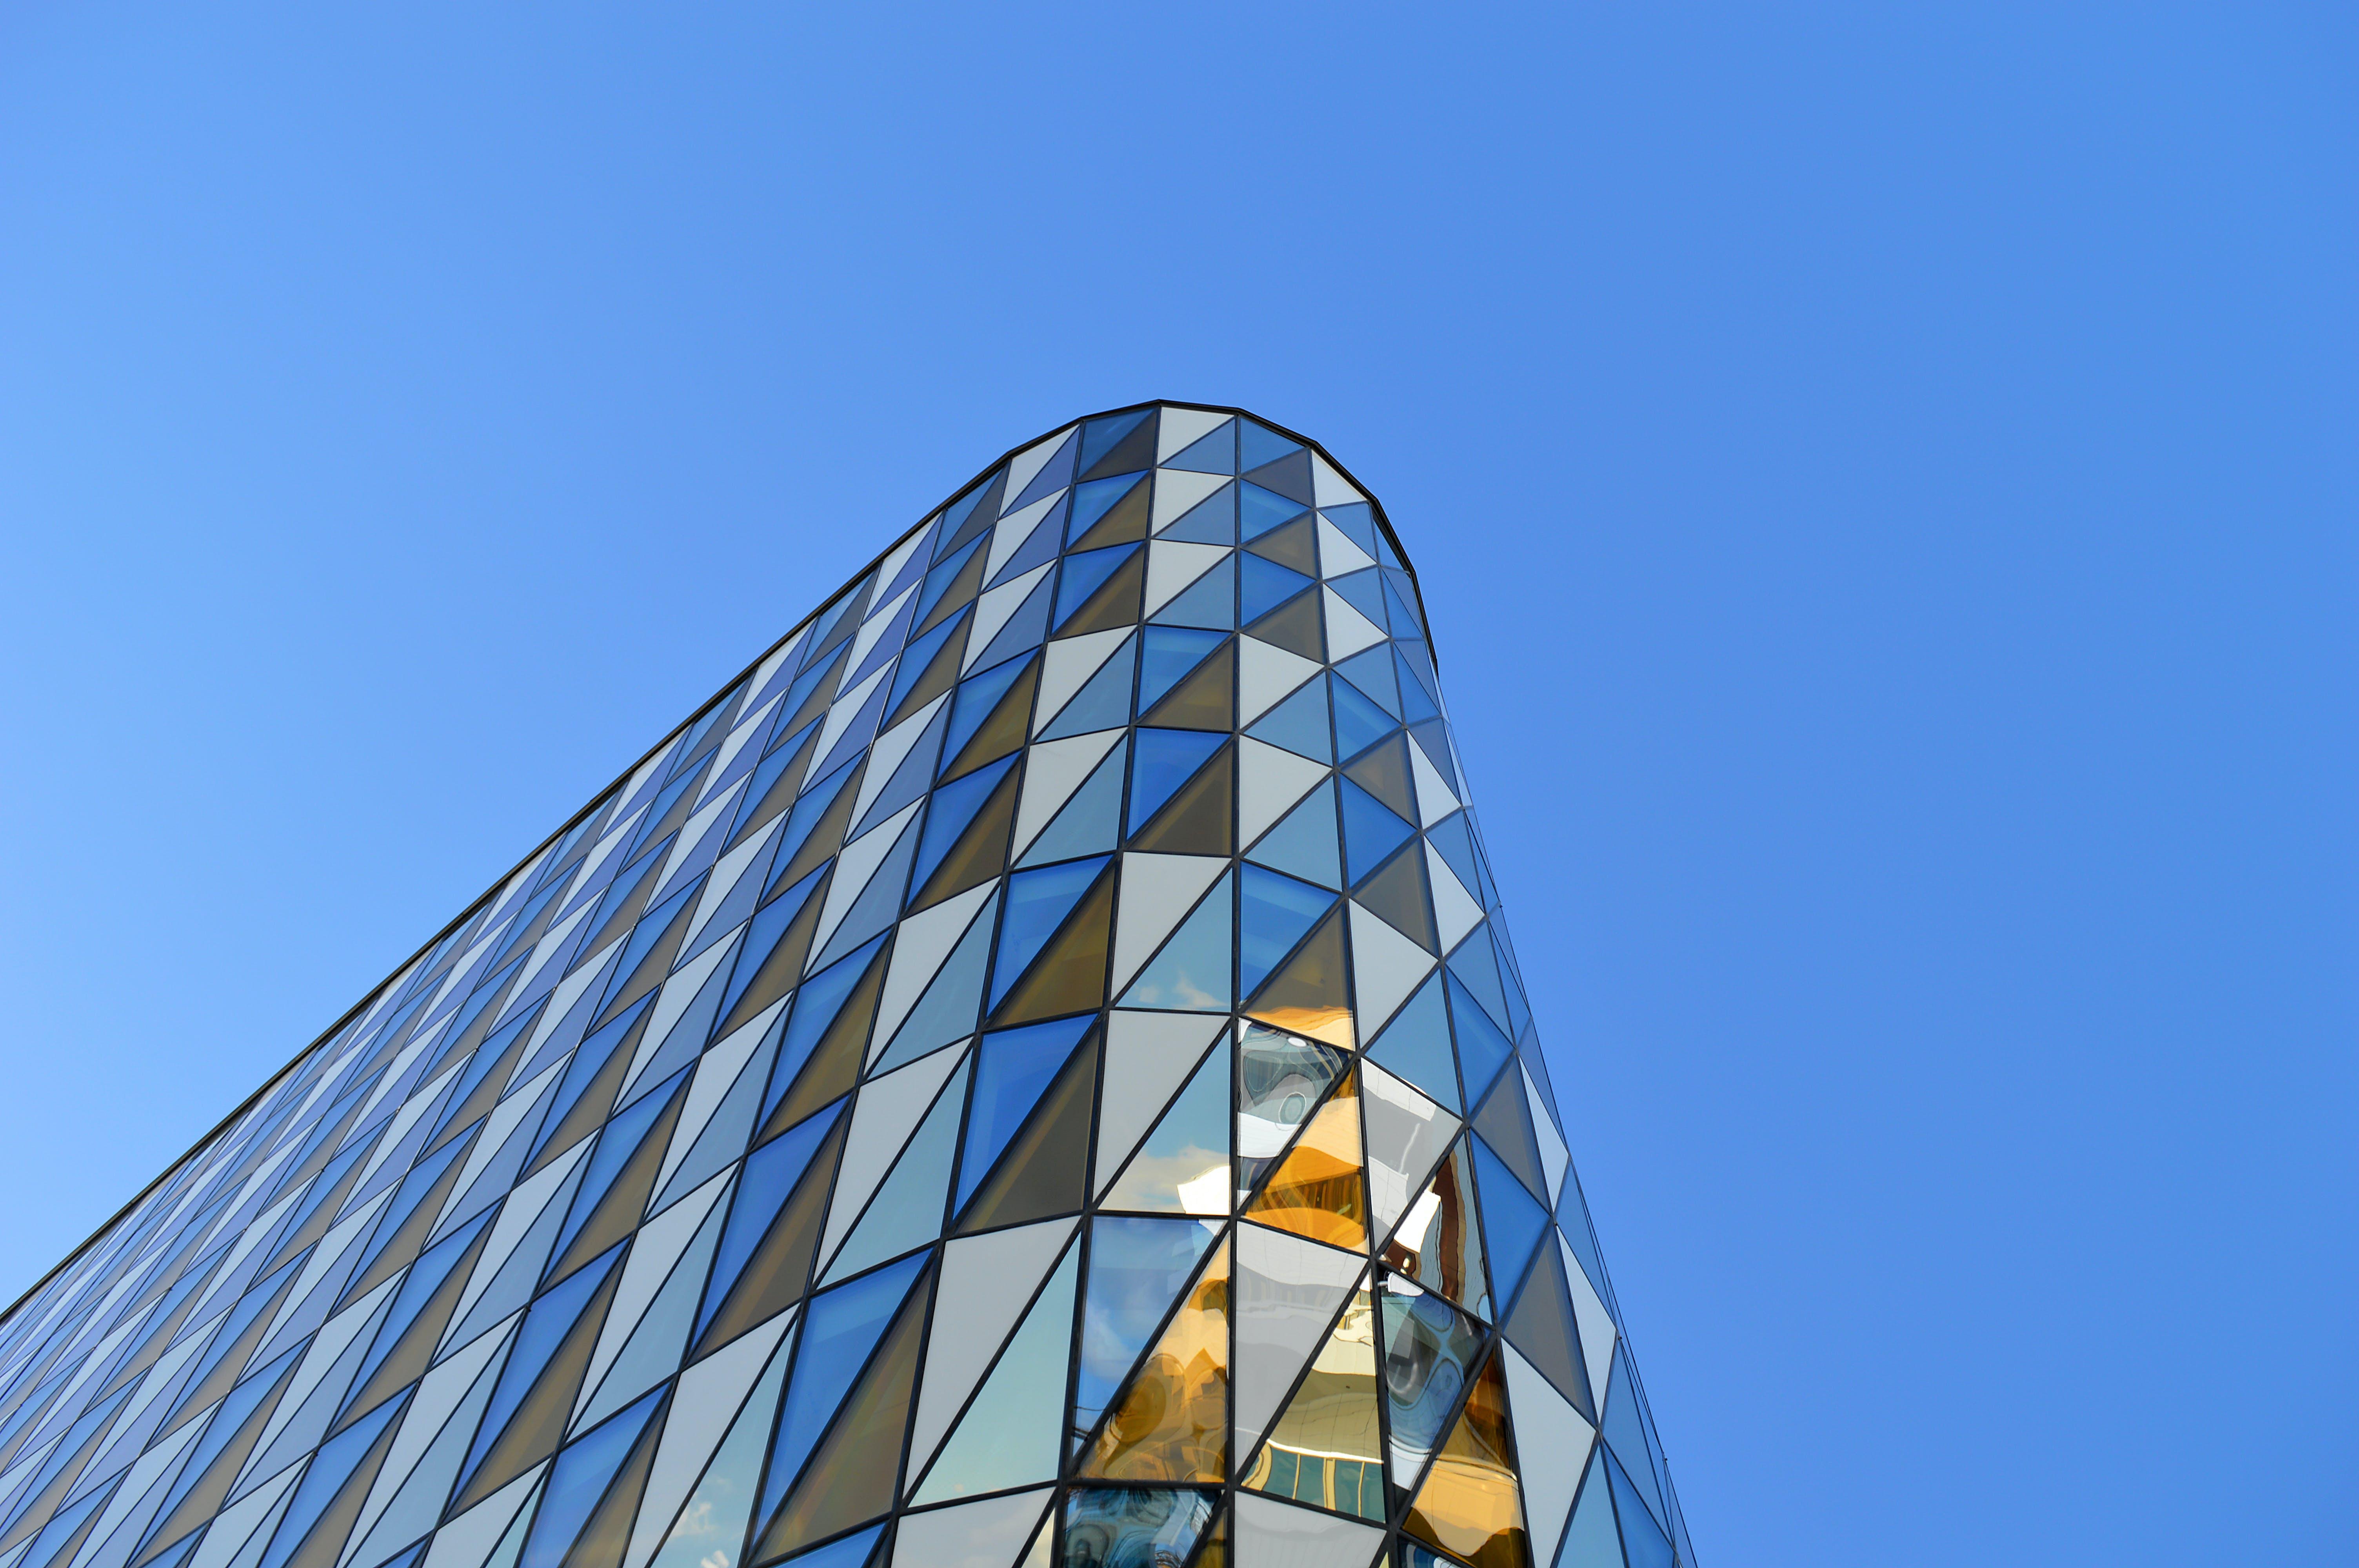 Gratis arkivbilde med arkitektur, bygning, fasade, futuristisk